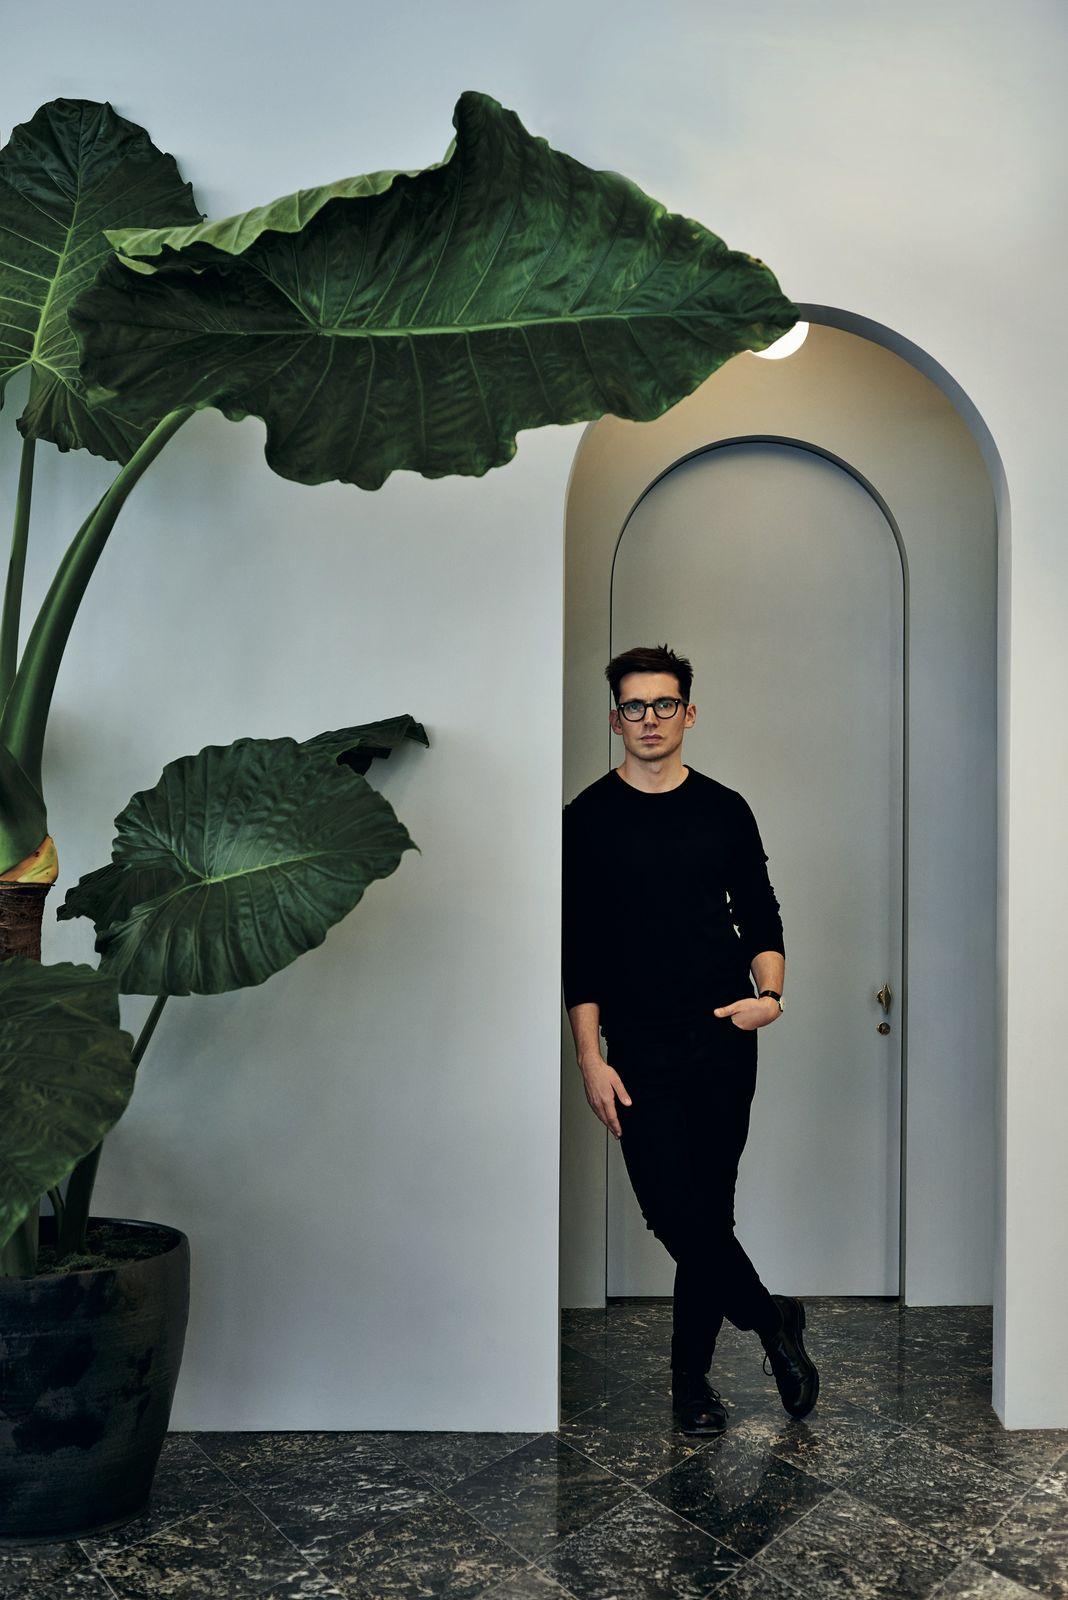 Erdem Moralioglu fashion designer